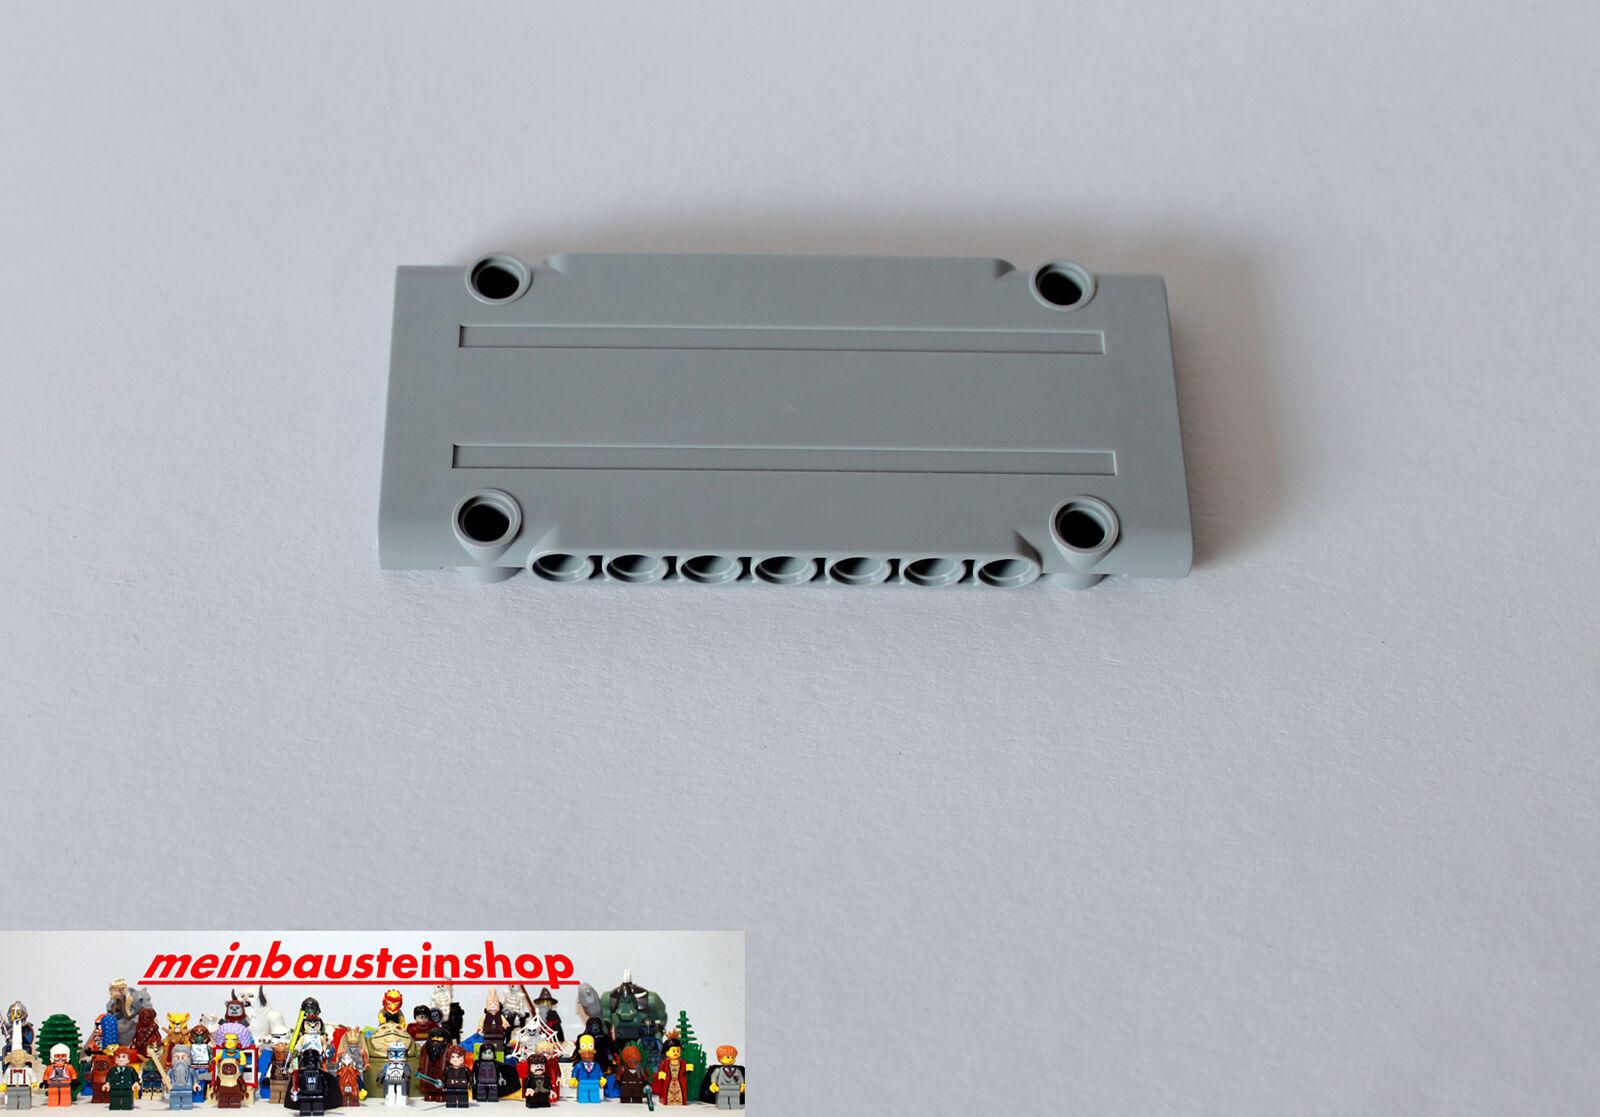 4x New Lego Technic EV3 Panel Plate 5x11x1 Light Bluish Grey 64782